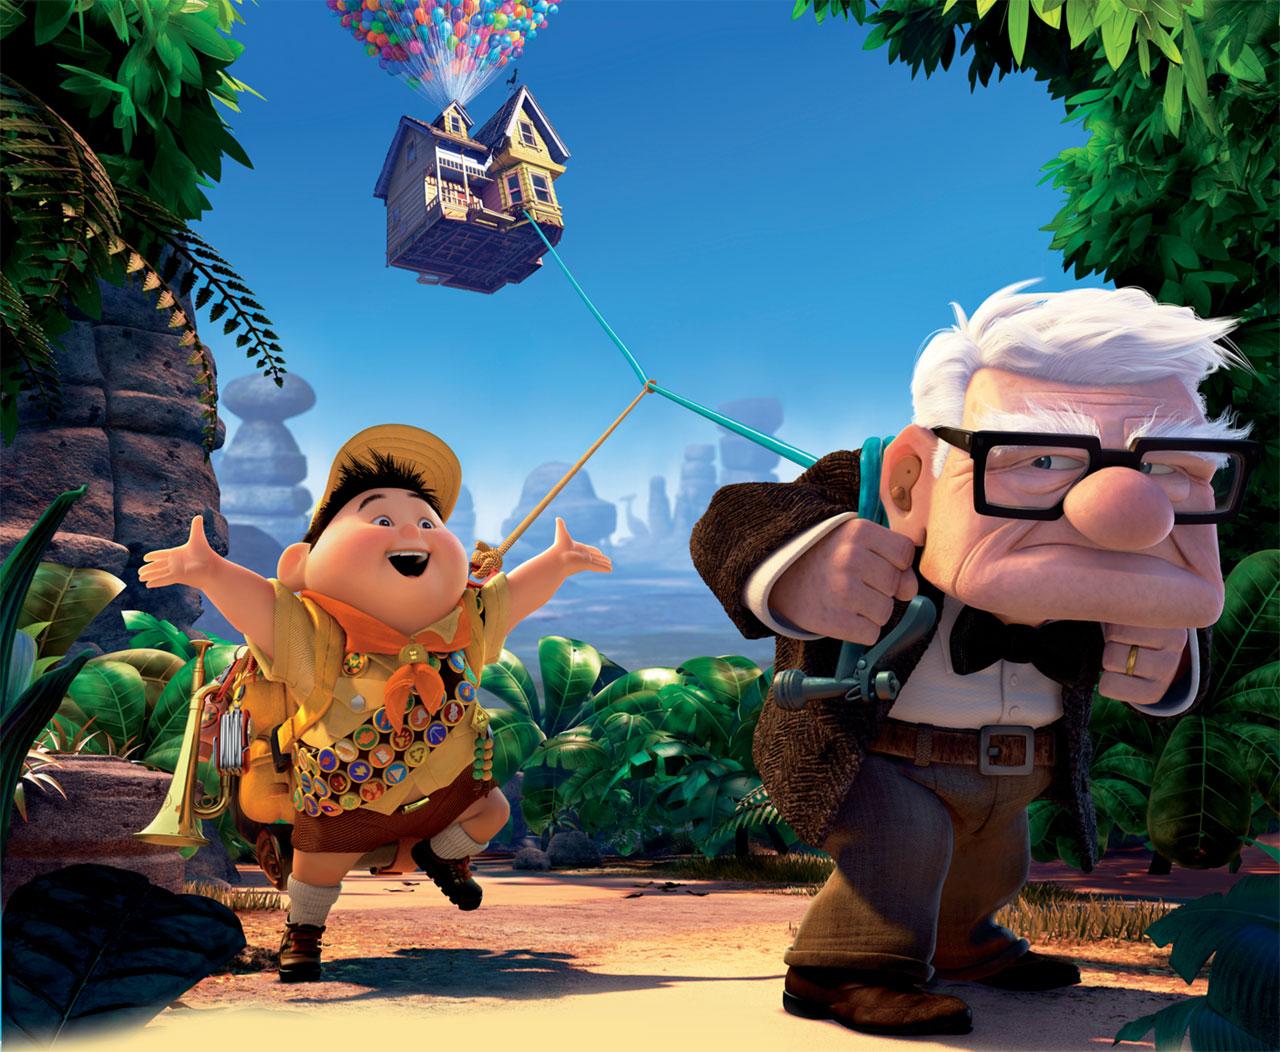 Image du film La-Haut des Studio Pixar